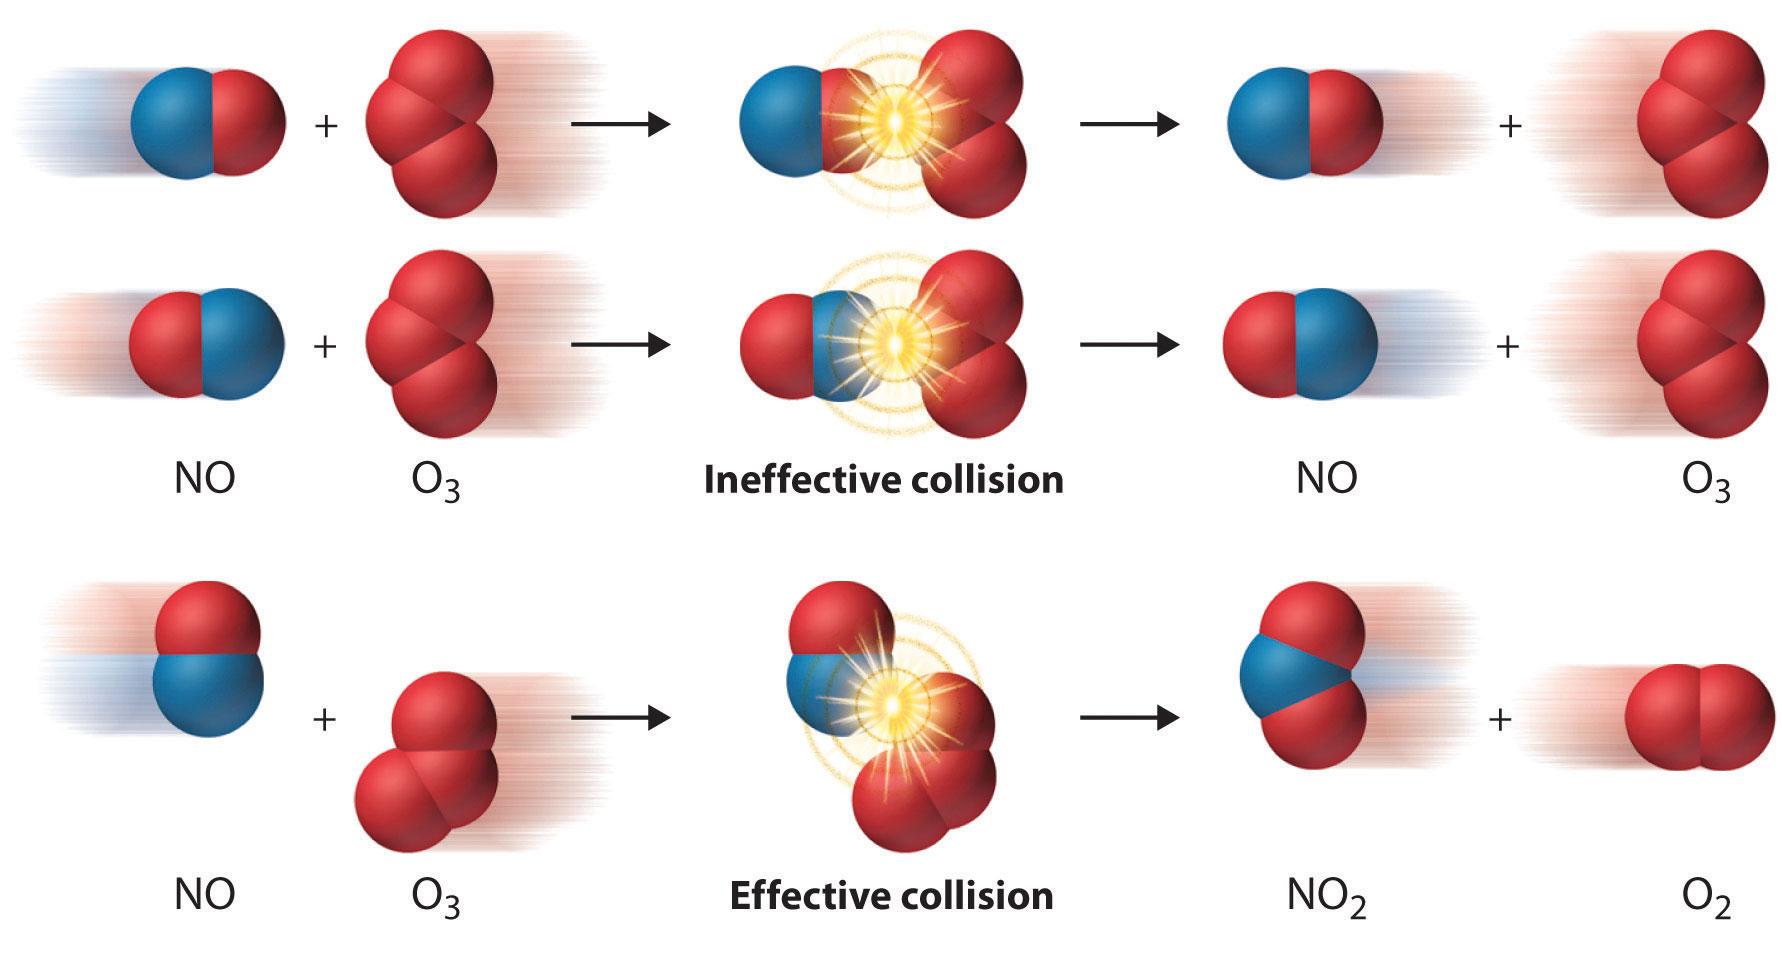 http://chemwiki.ucdavis.edu/Physical_Chemistry/Kinetics/The_Collision_Model_of_Chemical_Kinetics